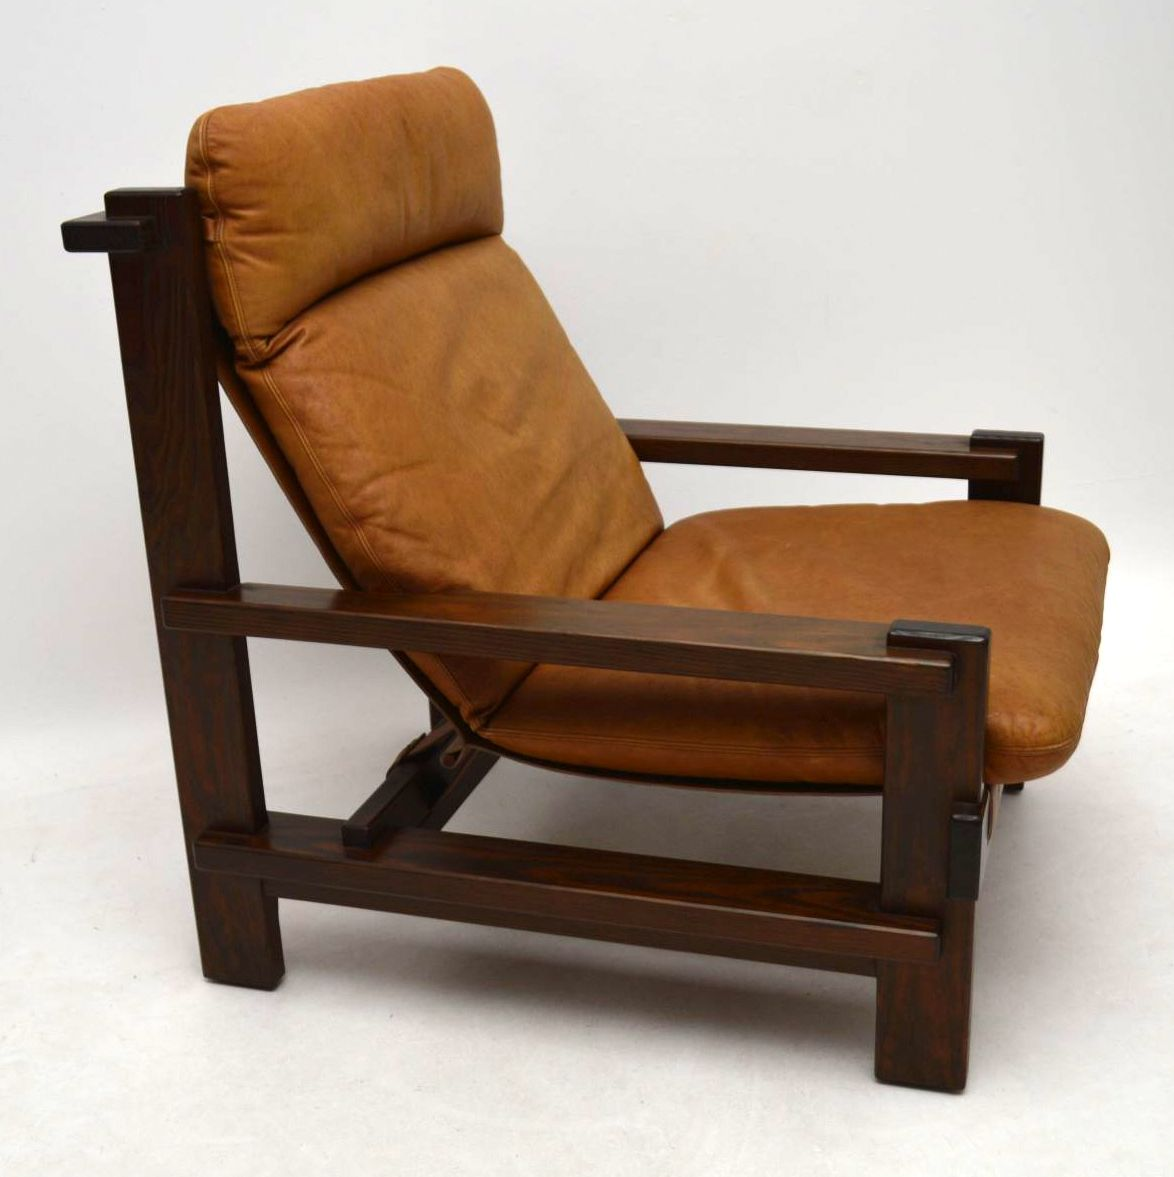 Vintage Furniture For Sale Online: Danish Vintage Leather Armchair